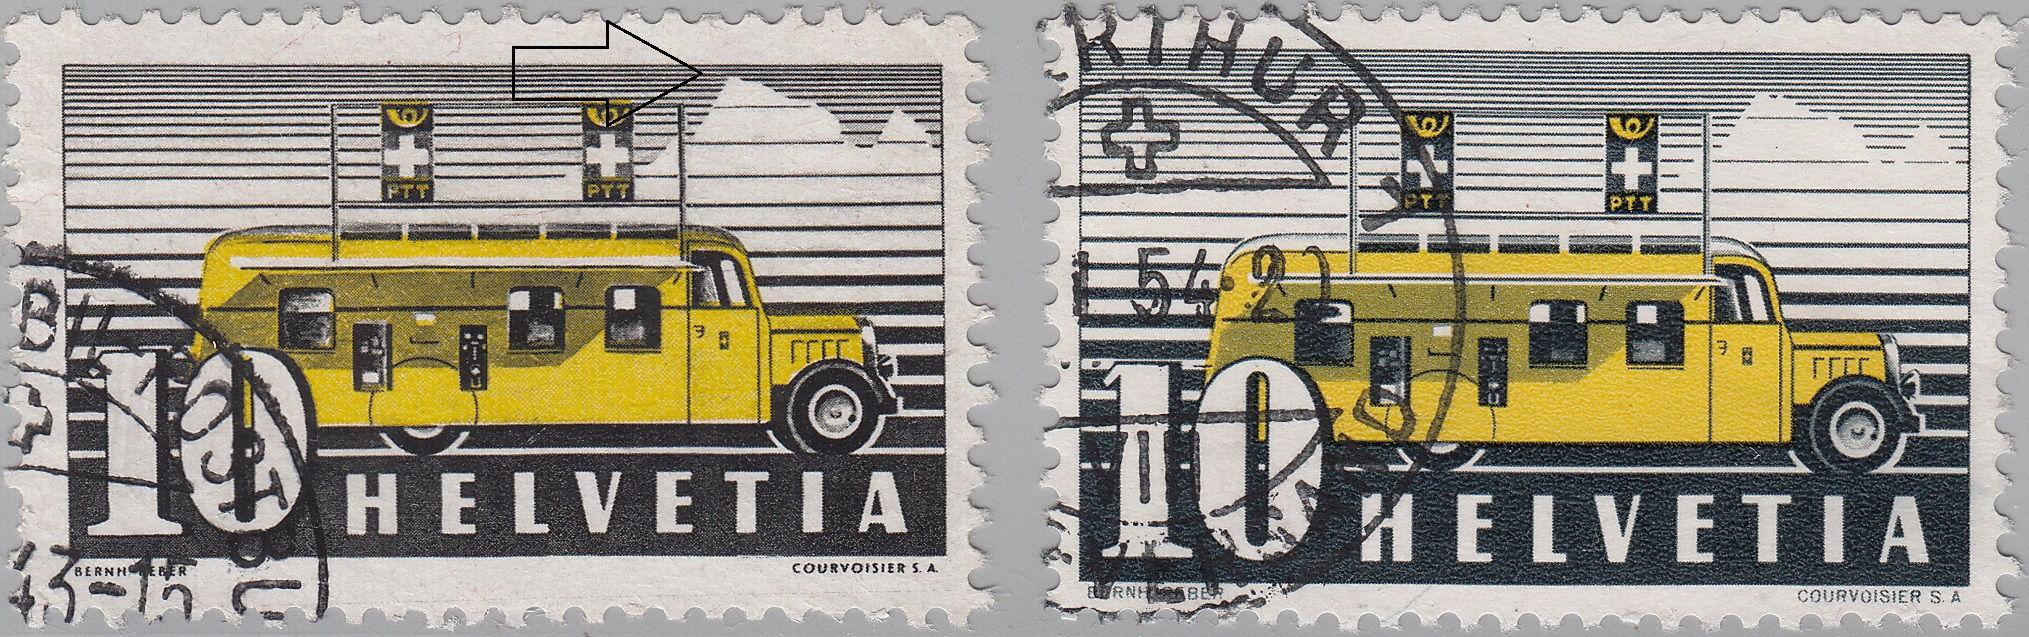 Switzerland - Scott #237 (1937) on the left and Scott #307 (1946) on the right.